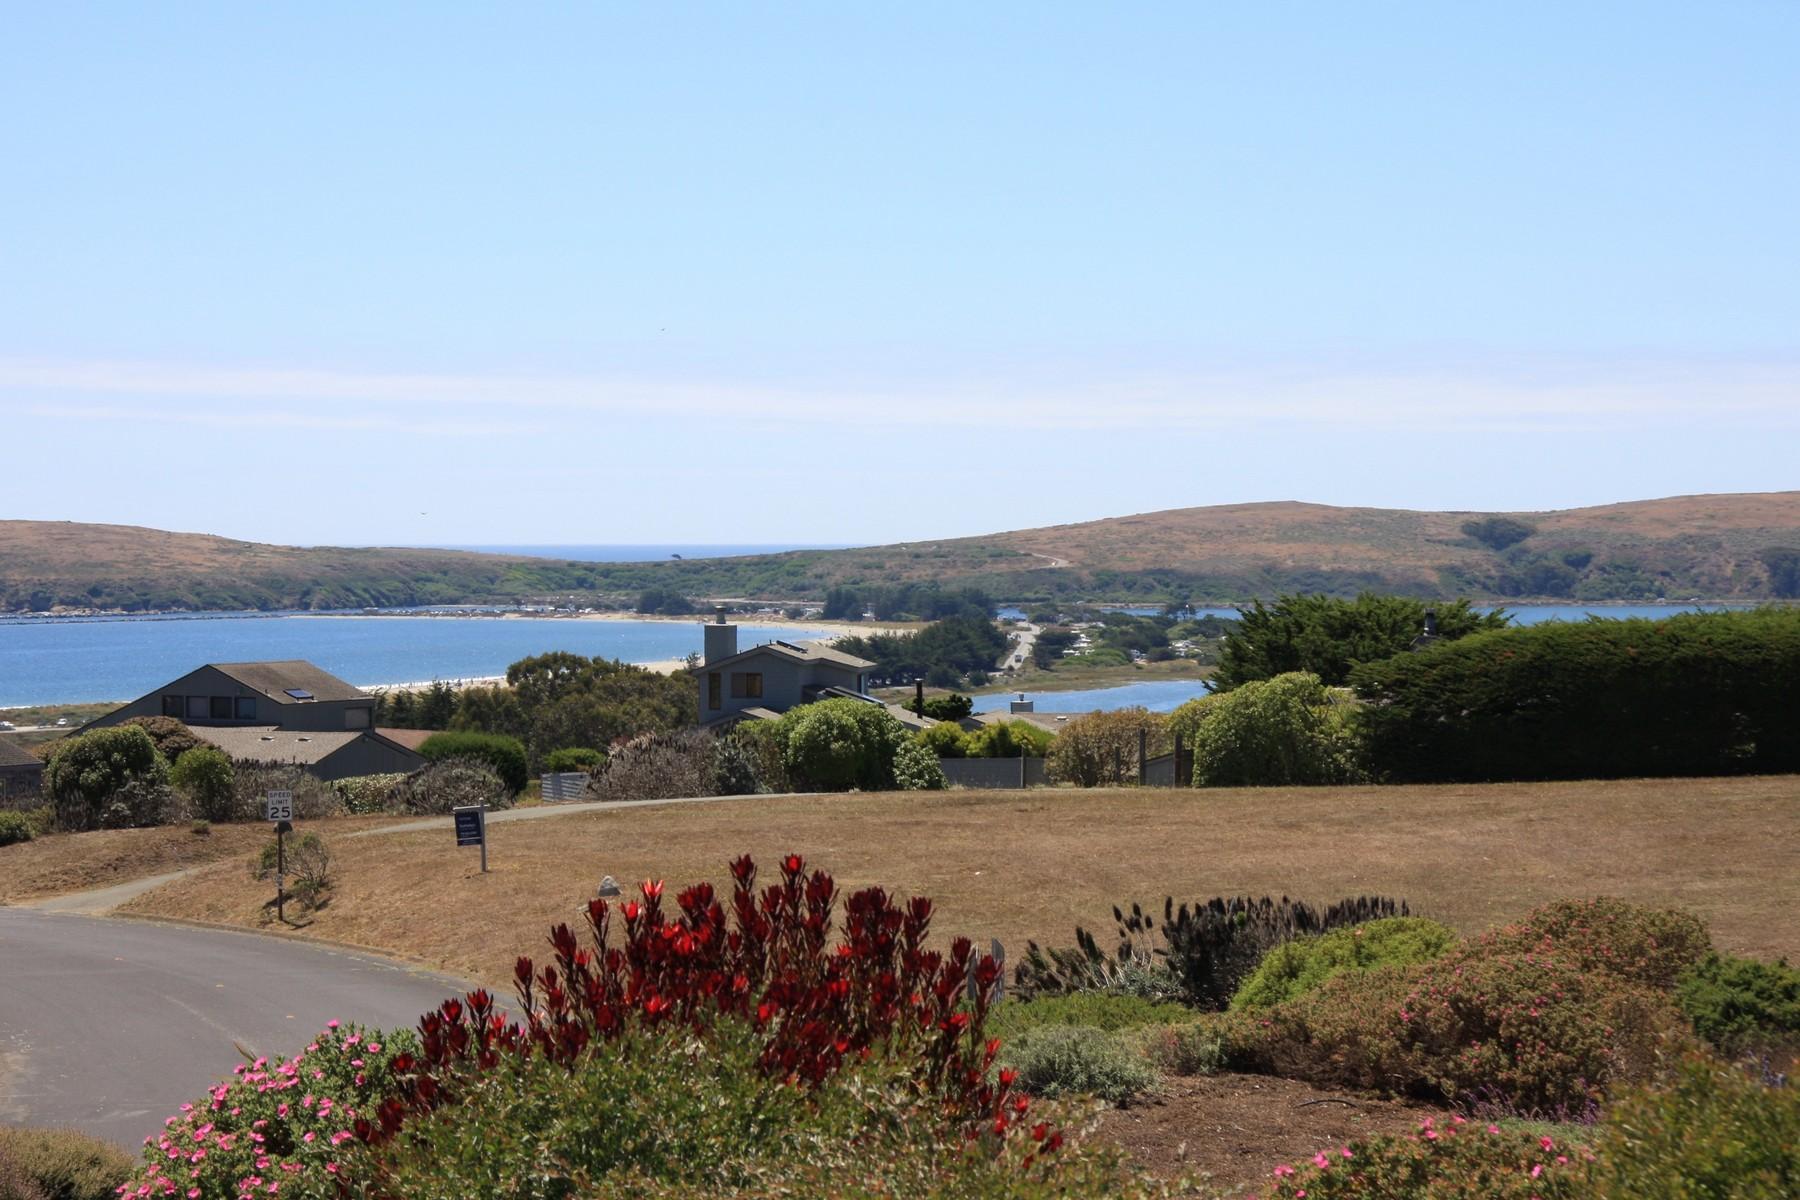 Land for Sale at 301 Mainsail Drive Bodega Bay, California 94923 United States